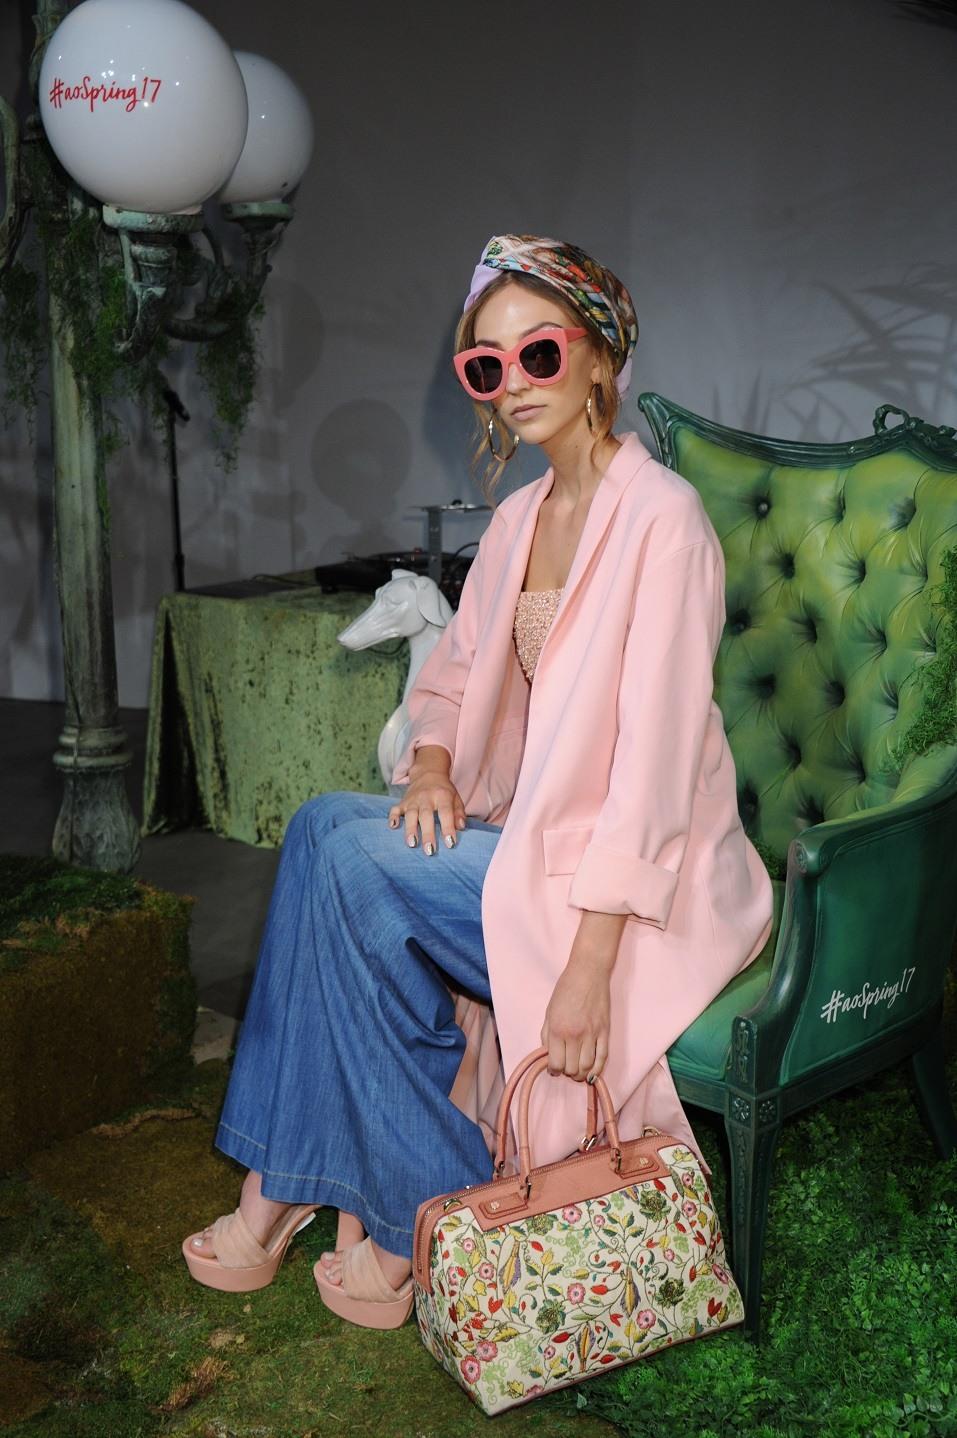 Models pose at the Alice + Olivia Spring/Summer 2017 presentation during New York Fashion Week